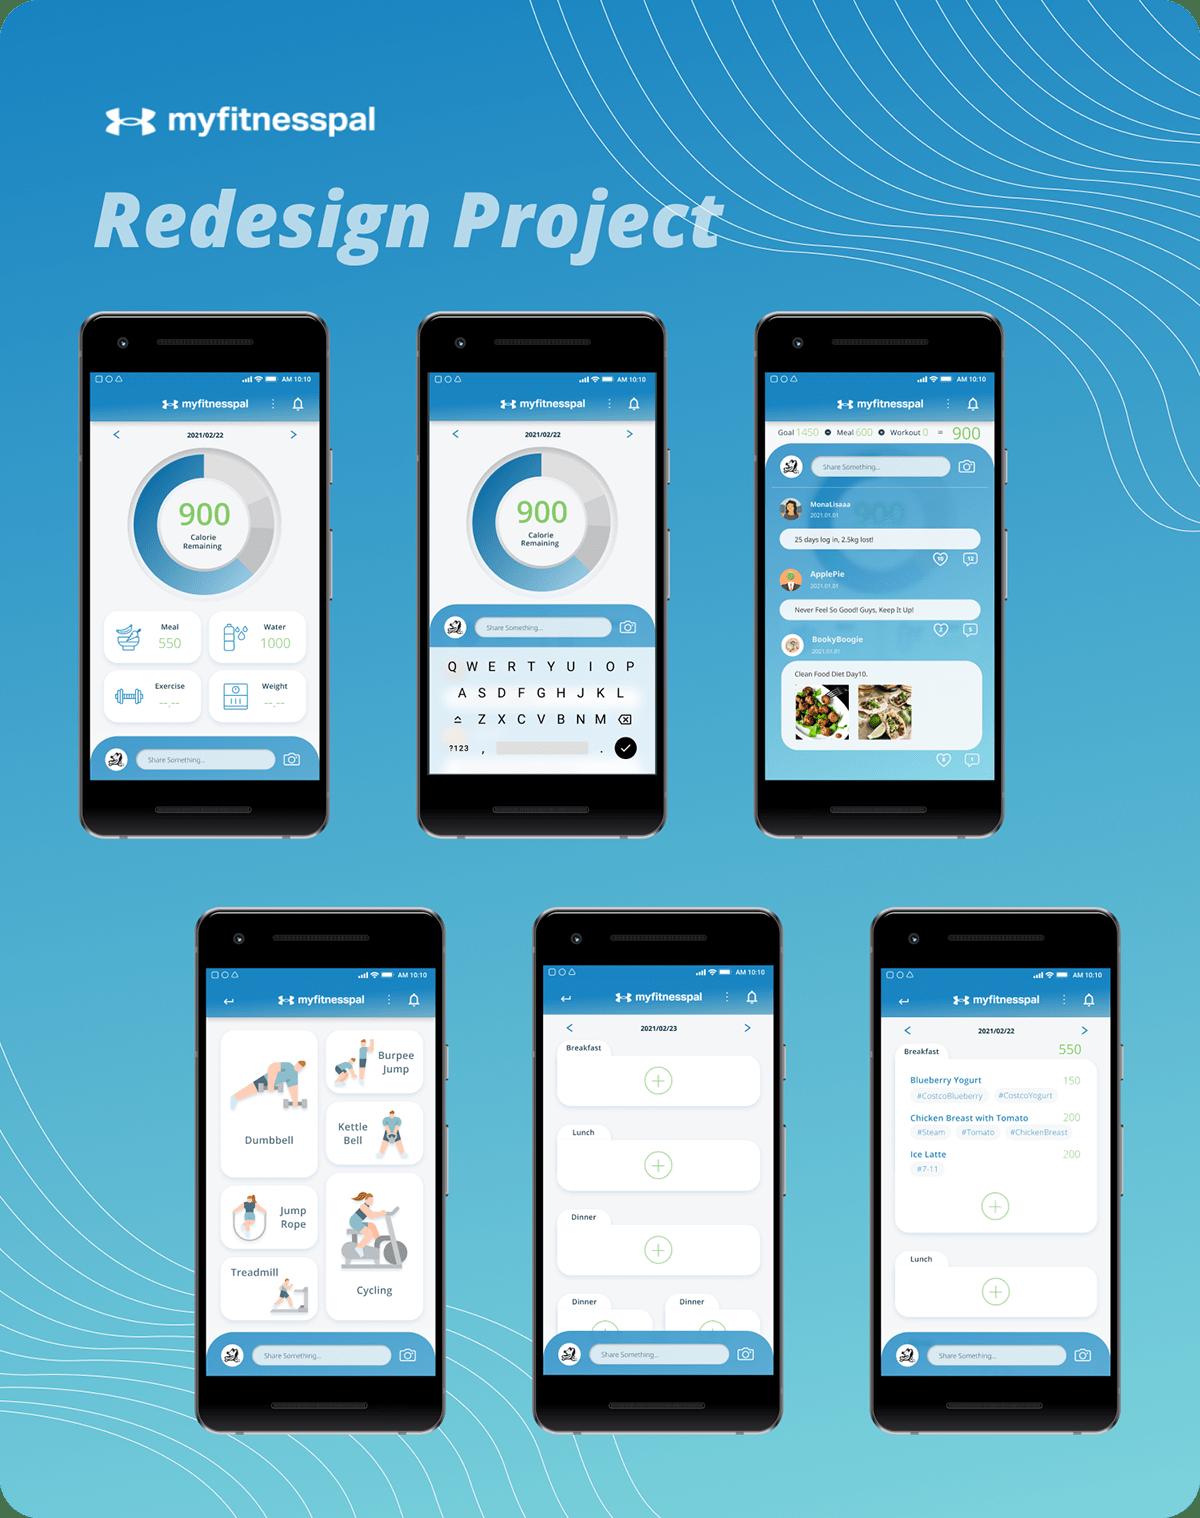 app design app redesign fitnessapp myfitnesspal redesign ui design UI designer uiux